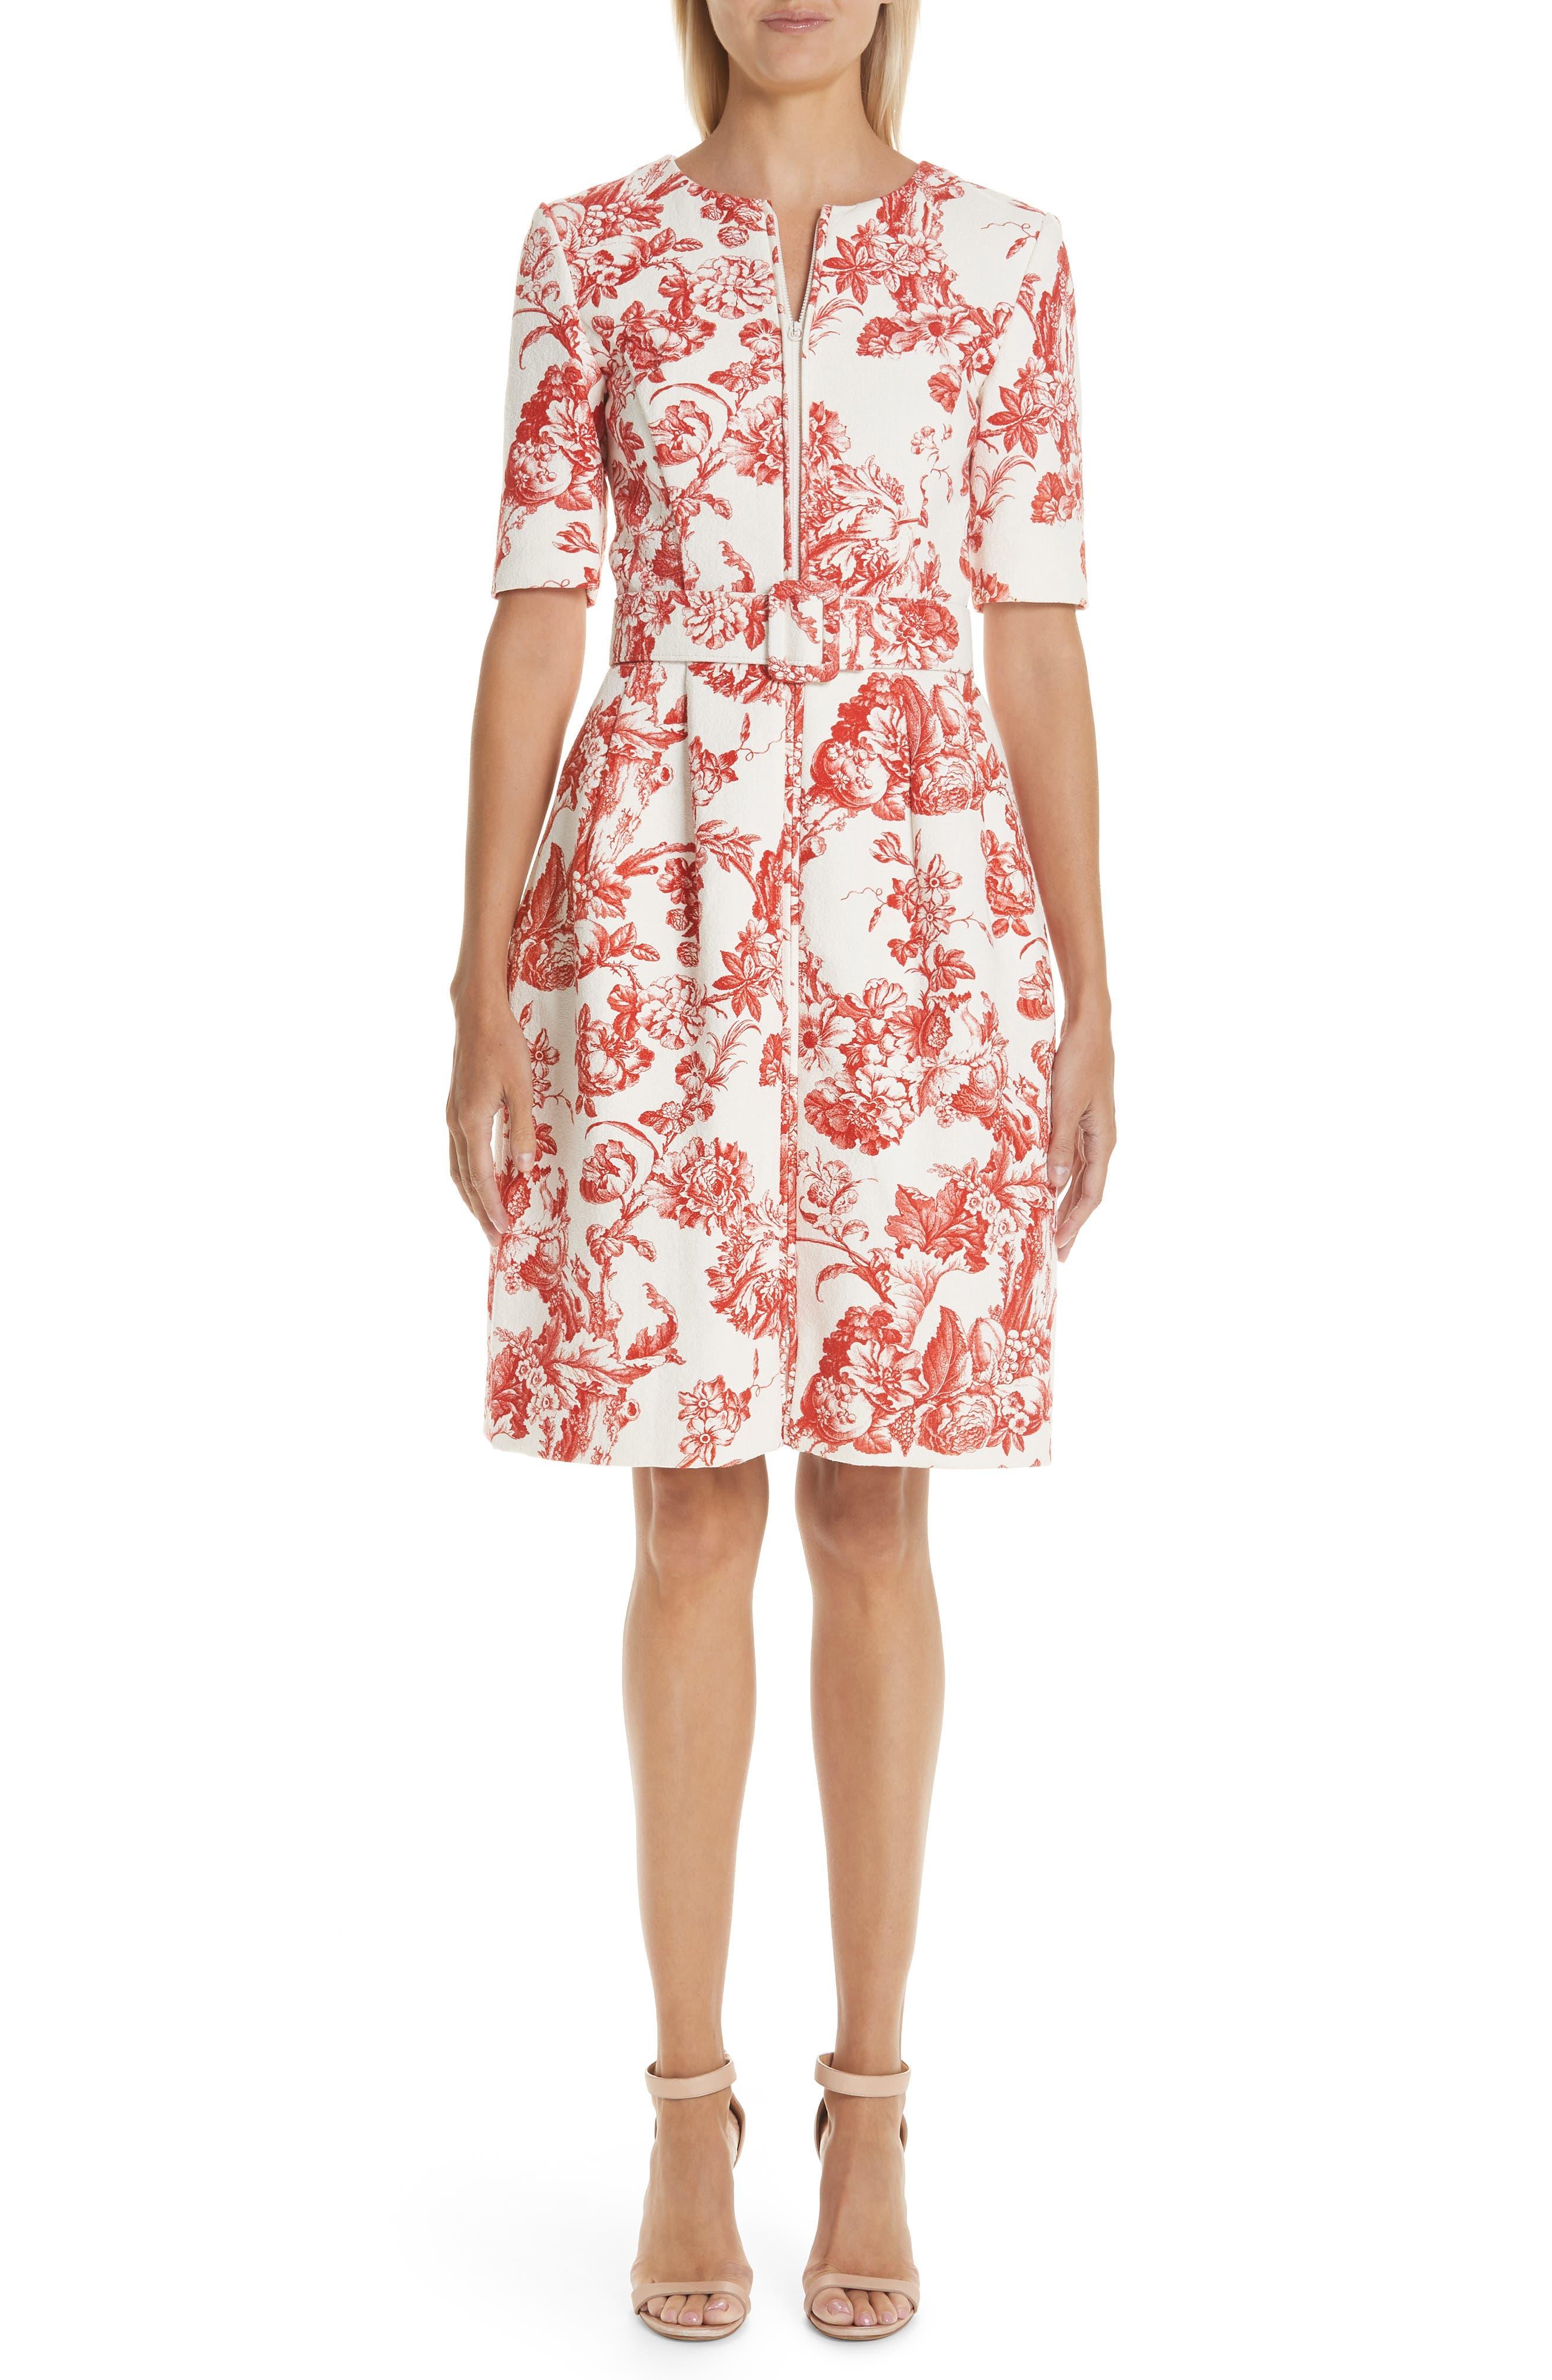 Oscar De La Renta Toile Print Belted Zip Front Dress, Red